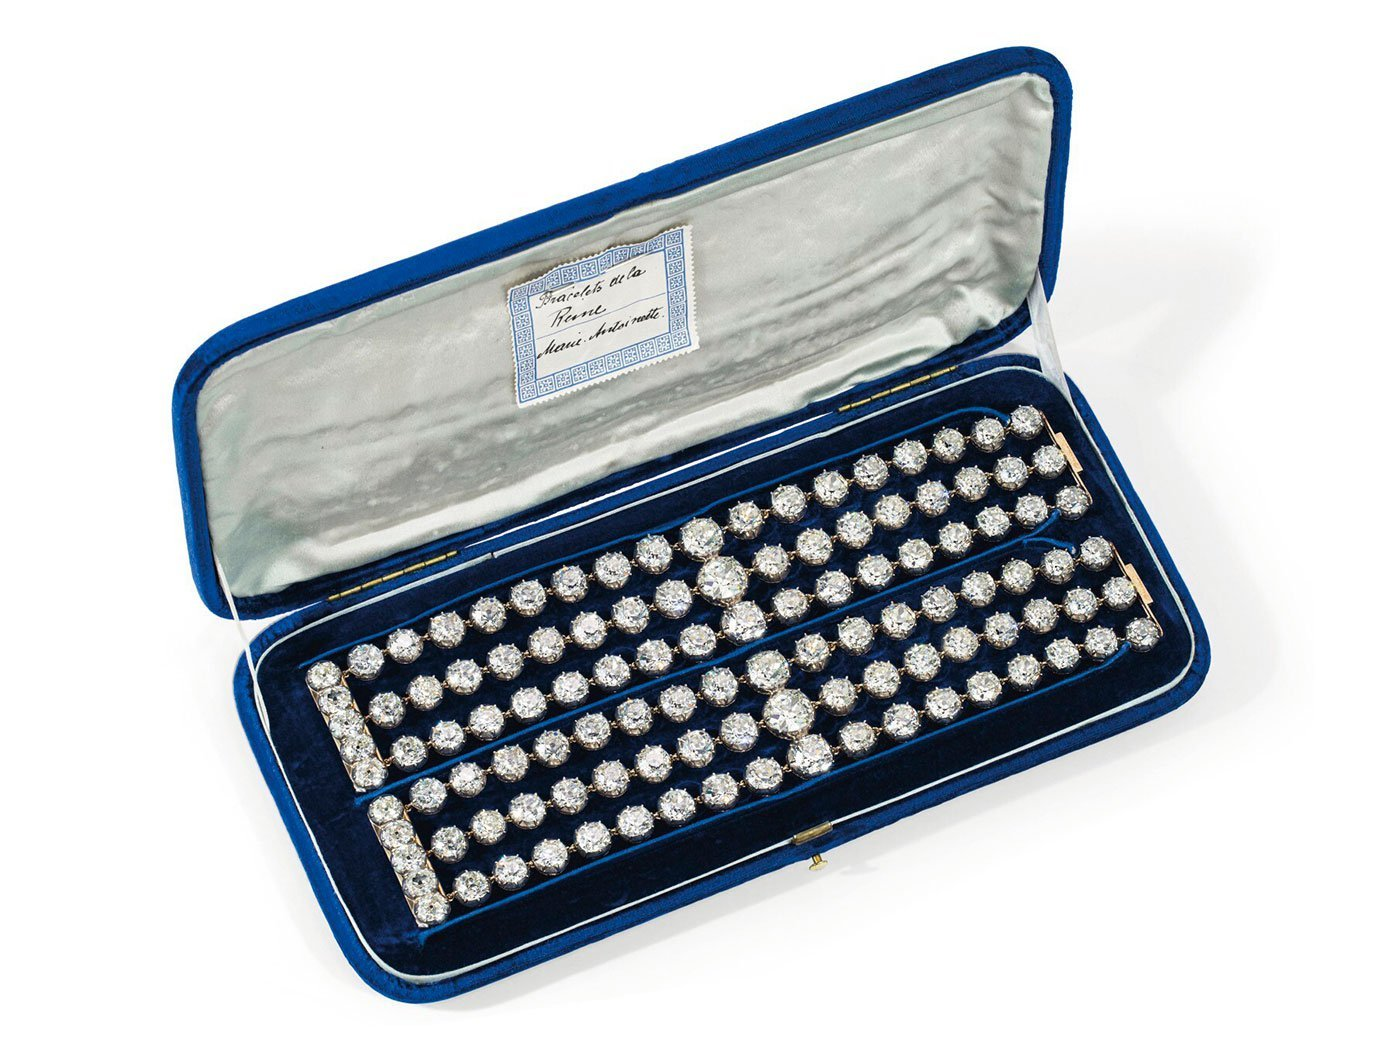 Marie Antoinette's Diamond Bracelets Are Going Up for Auction